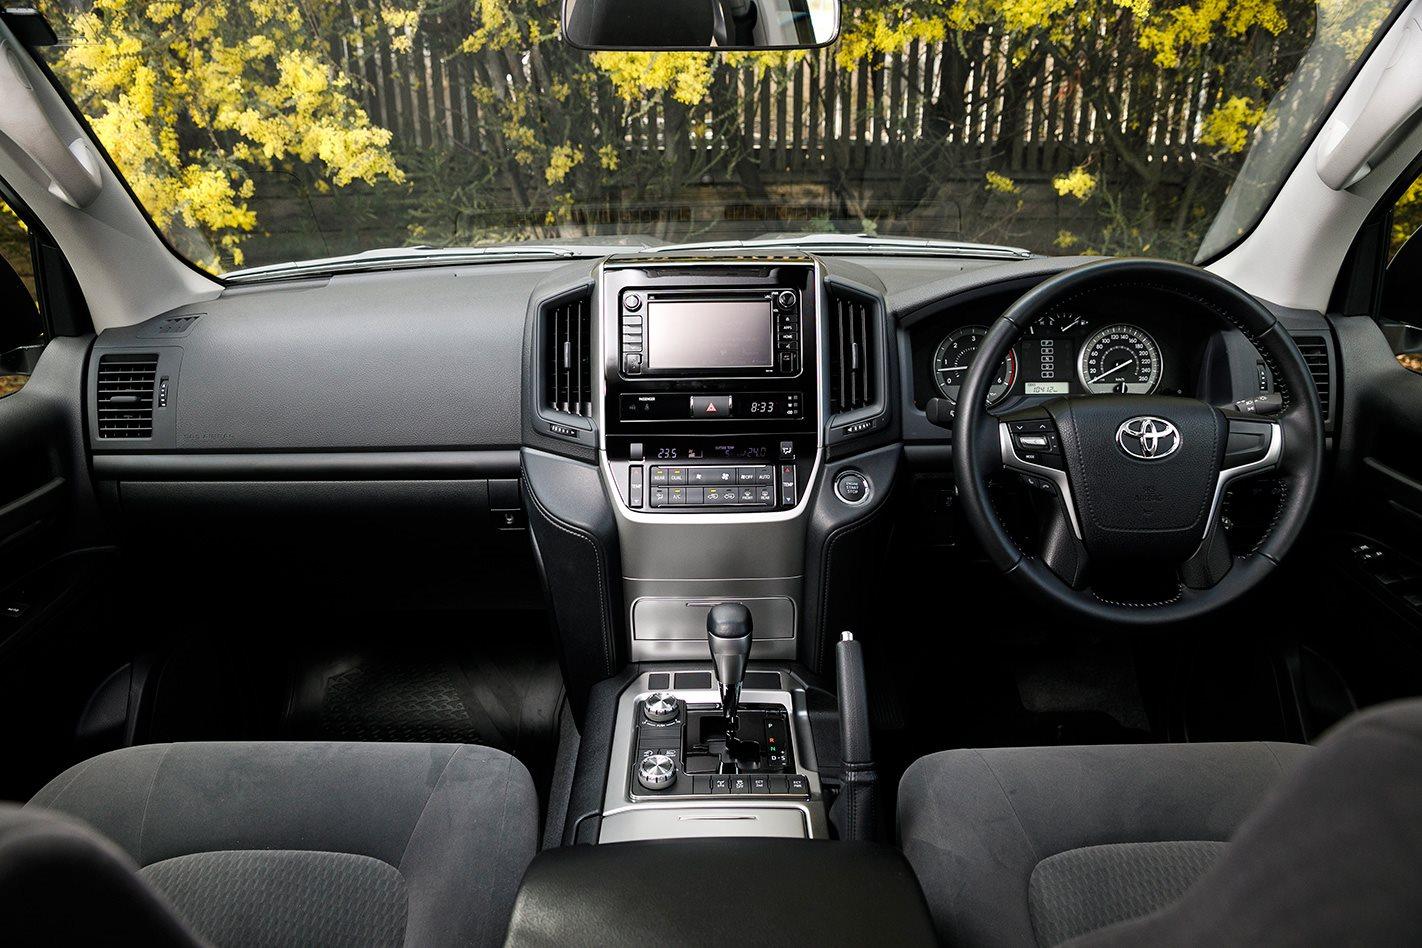 2017 Toyota LandCruiser 200 Series cabin.jpg